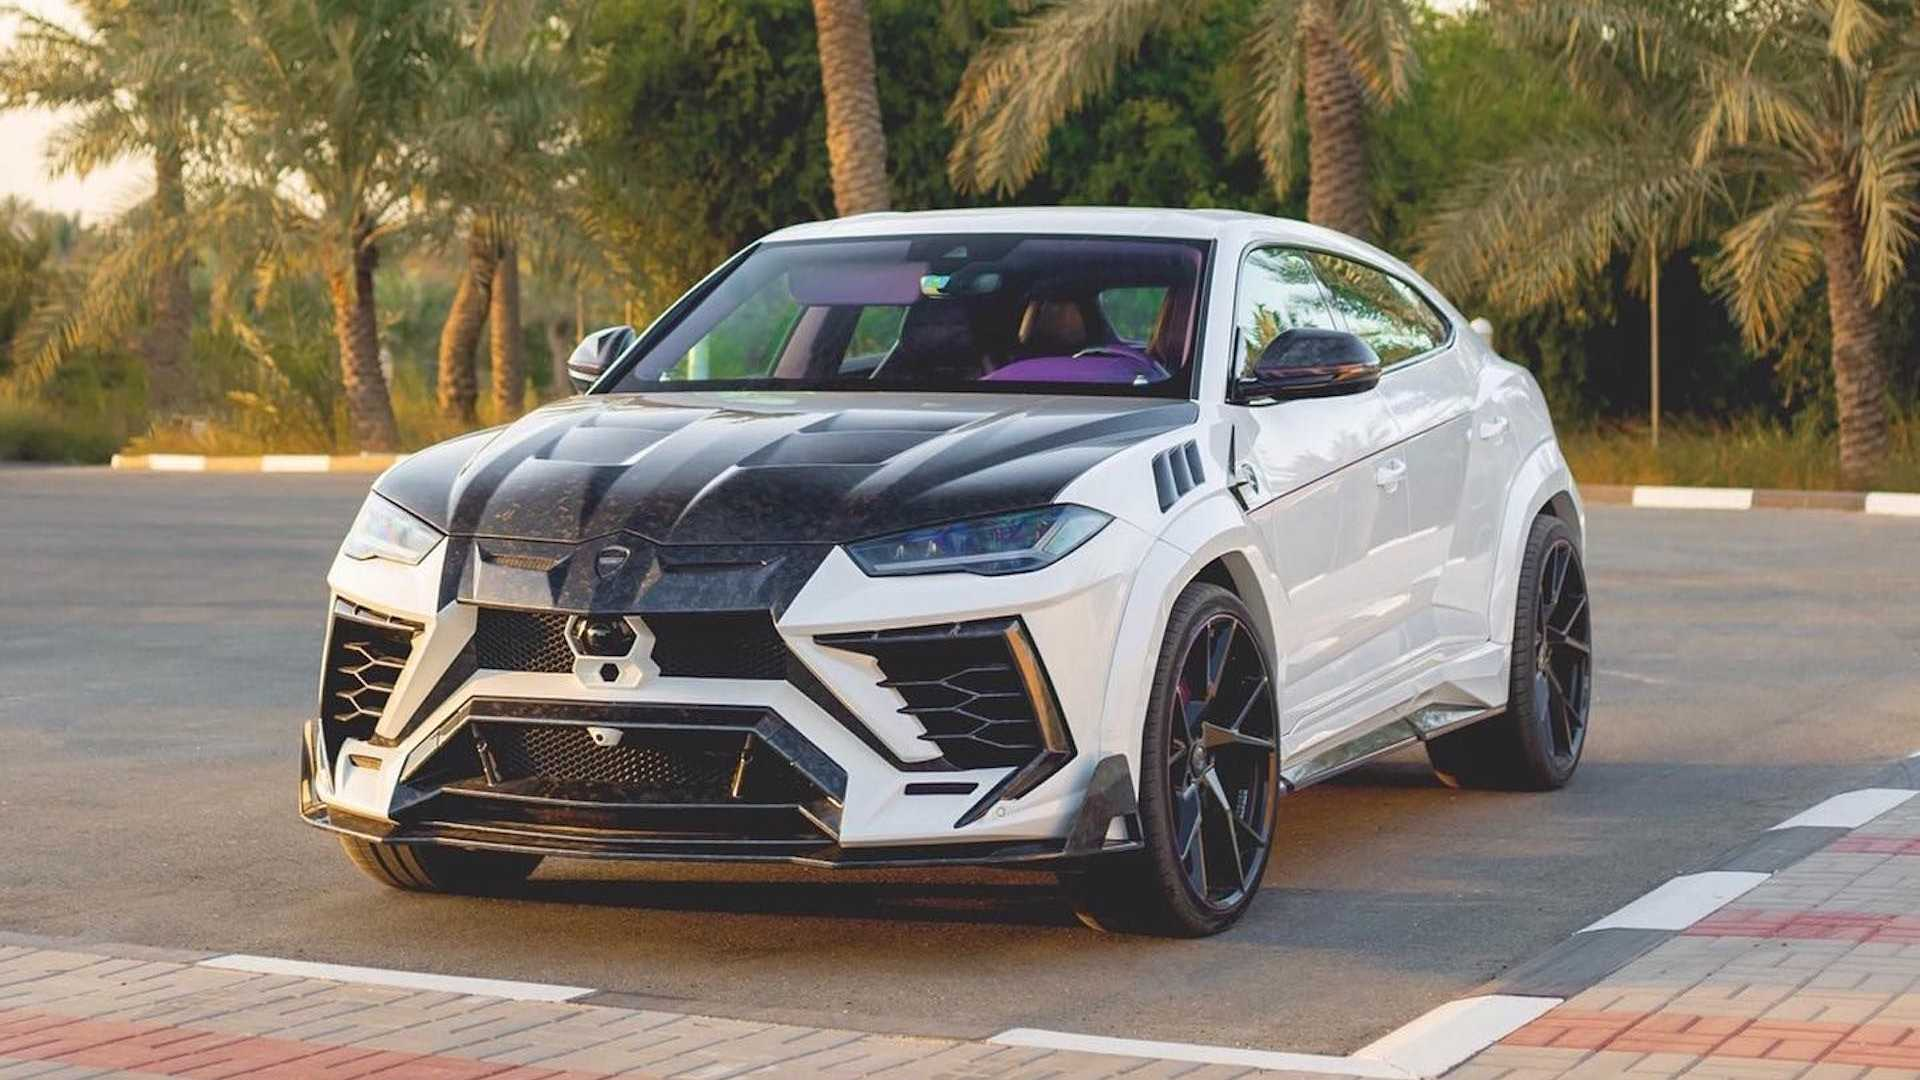 Lamborghini Urus With Purple Interior Is A Mansory Love/Hate Affair